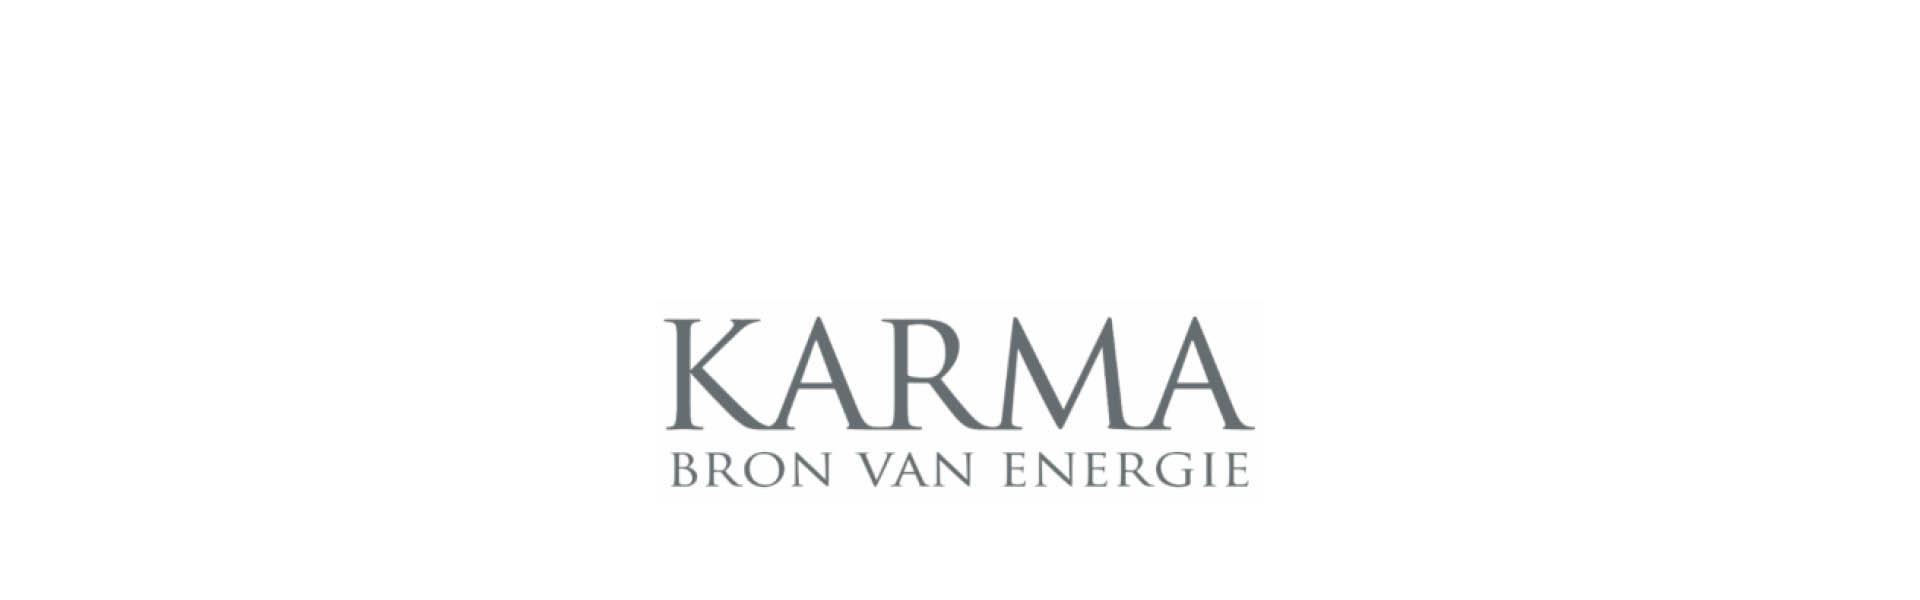 Shop de mooiste dames sieraden van Karma!